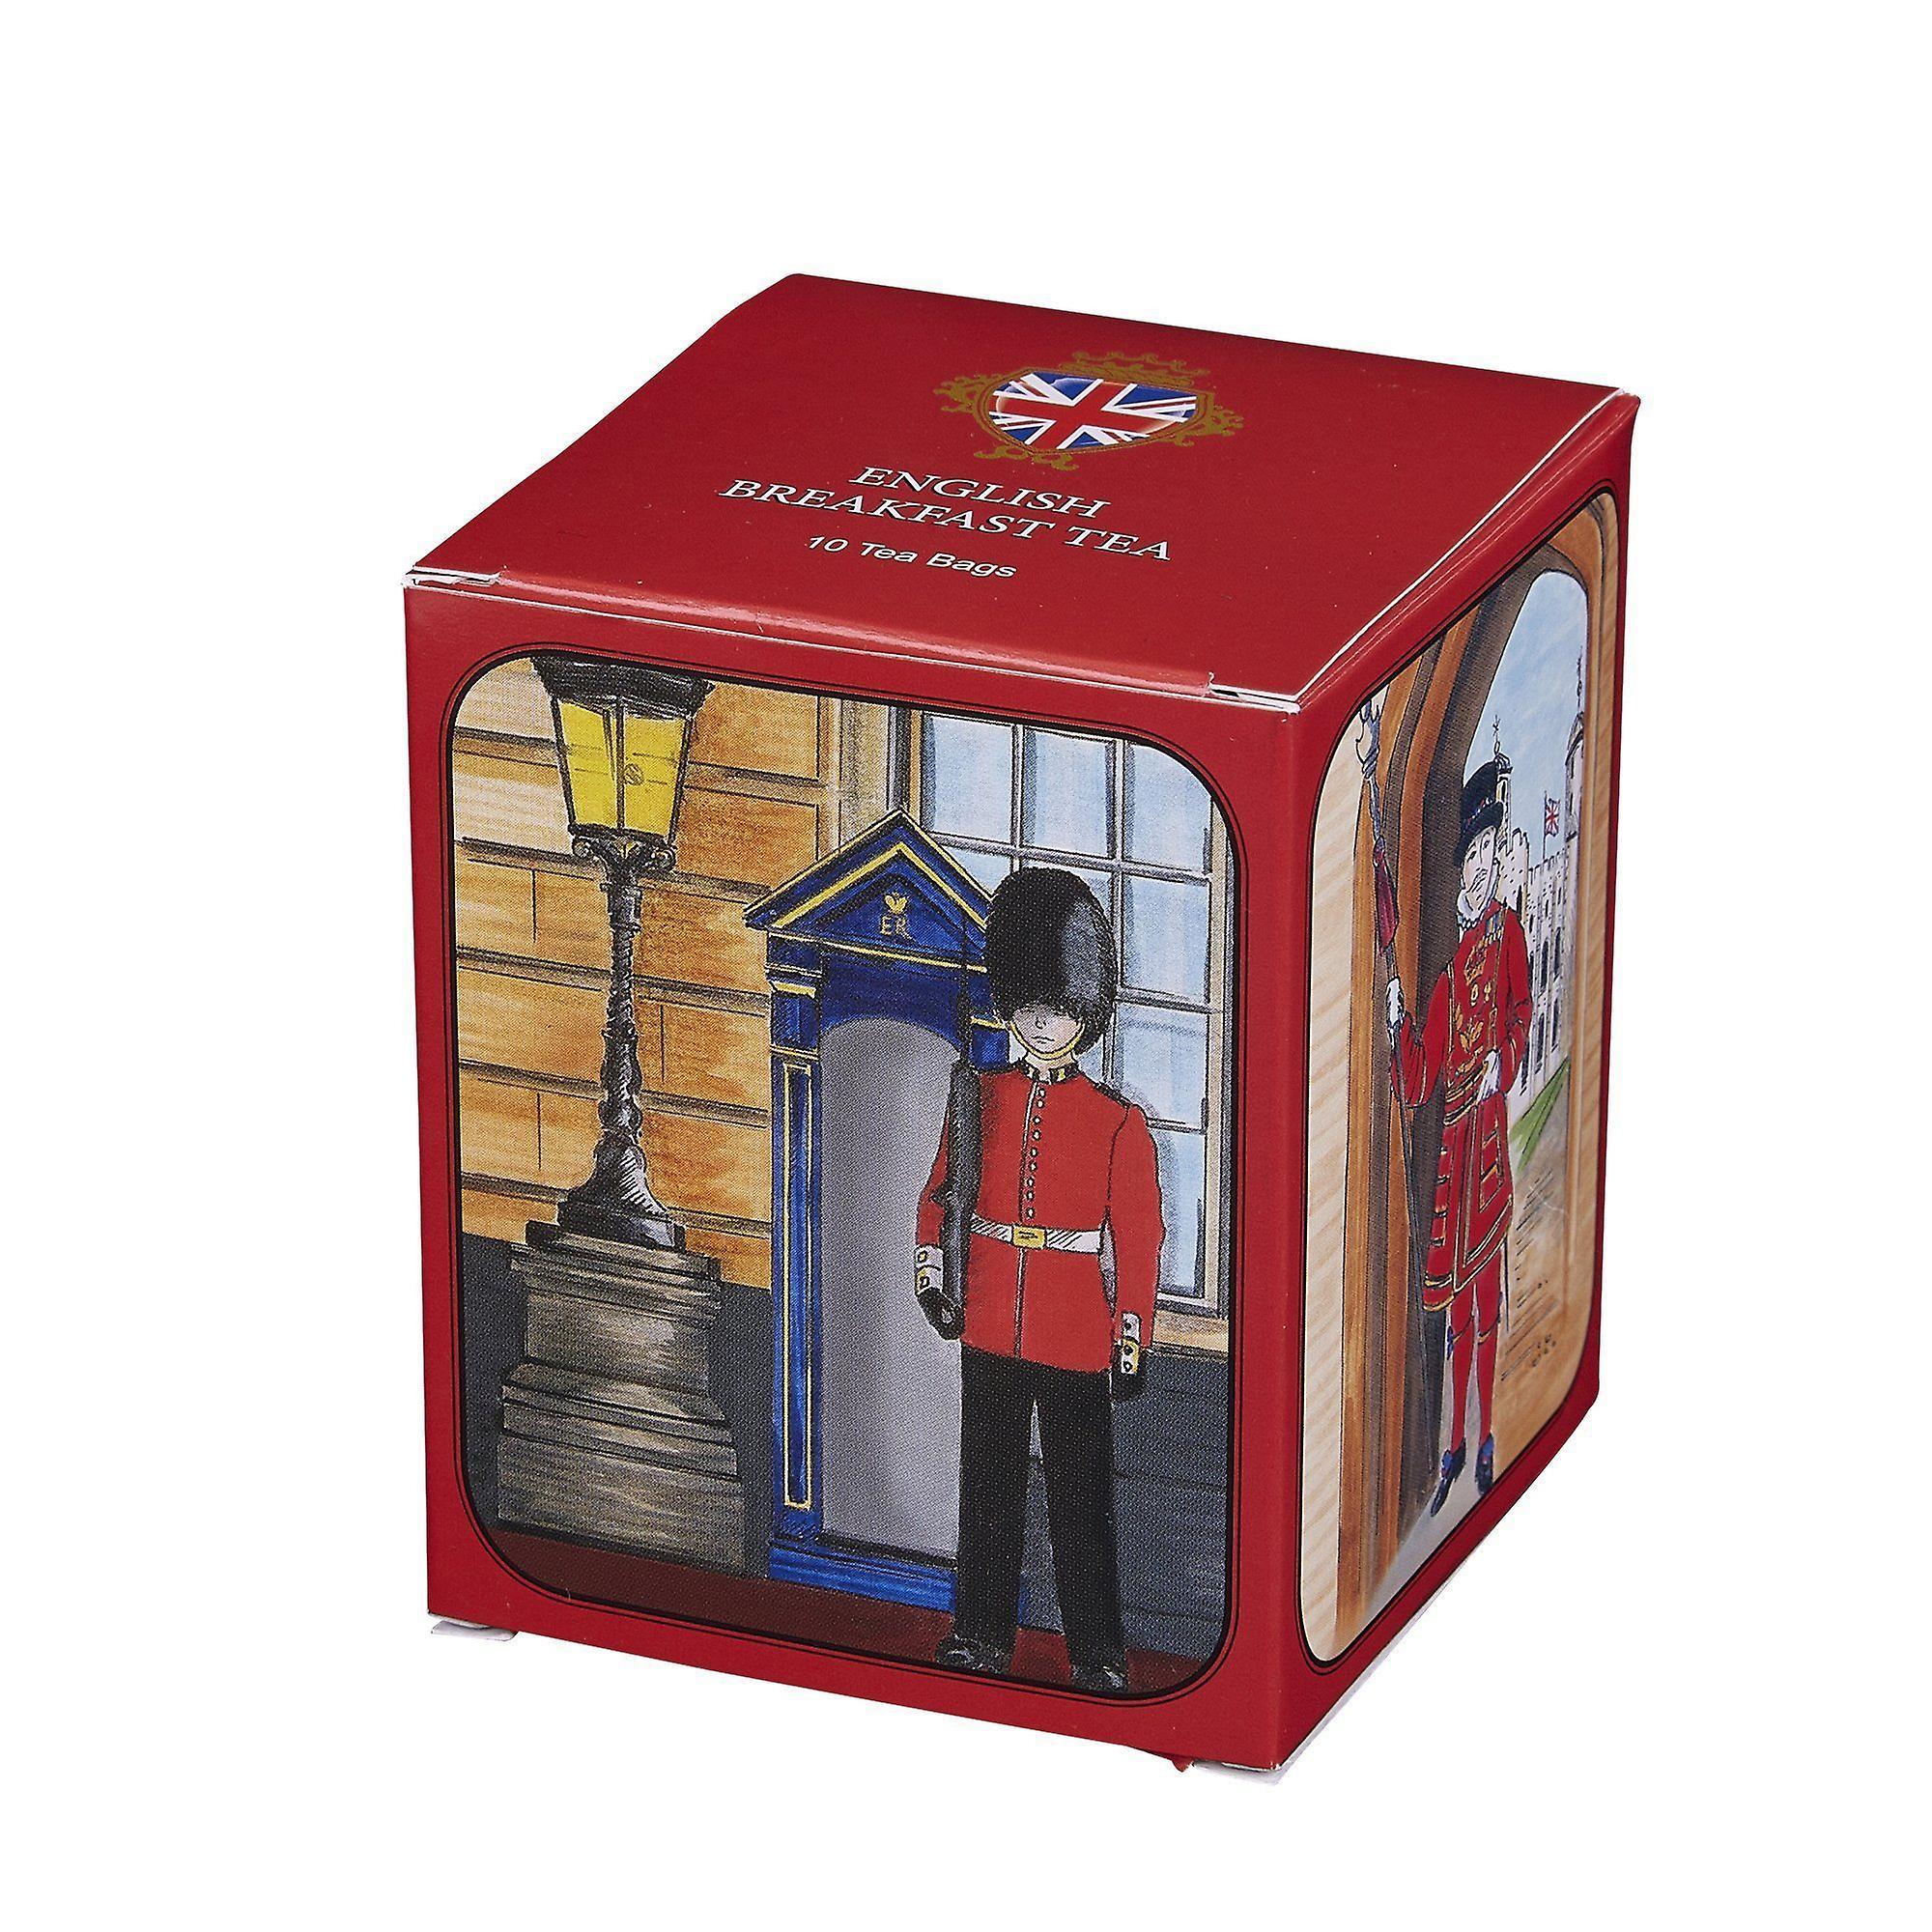 Coldstream guard english breakfast tea 10 teabag carton